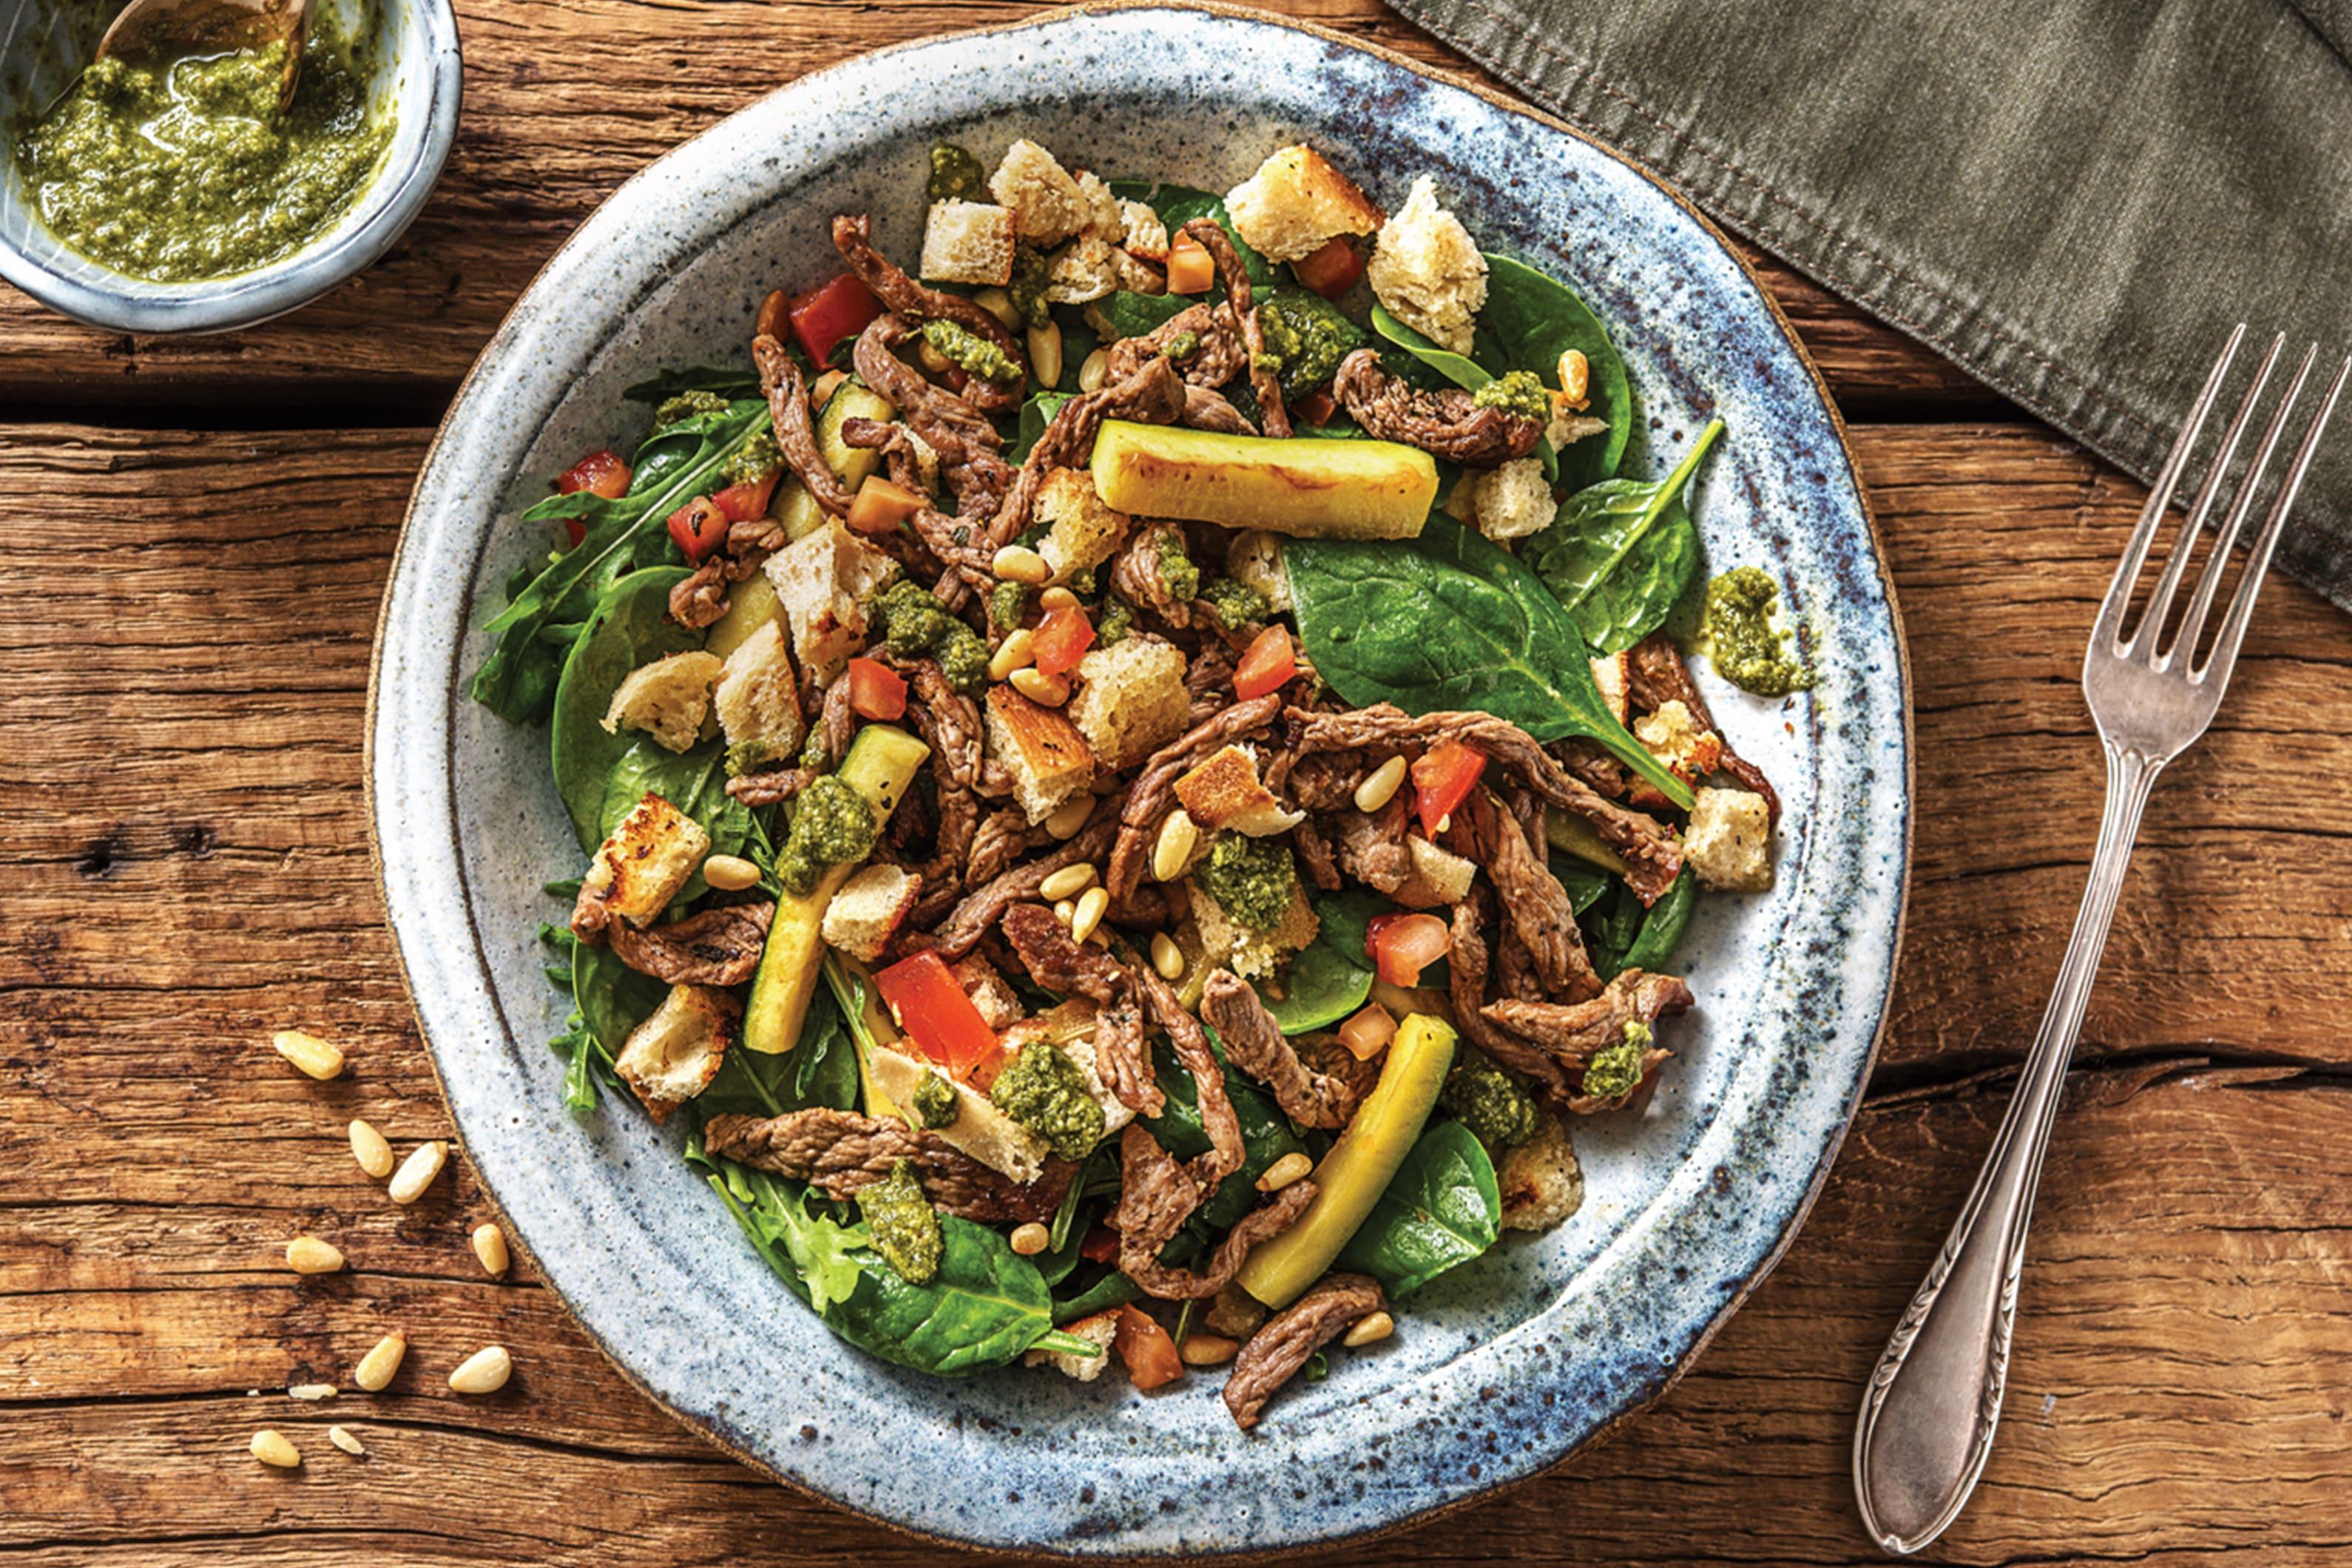 Quick Italian Pesto Beef Toss